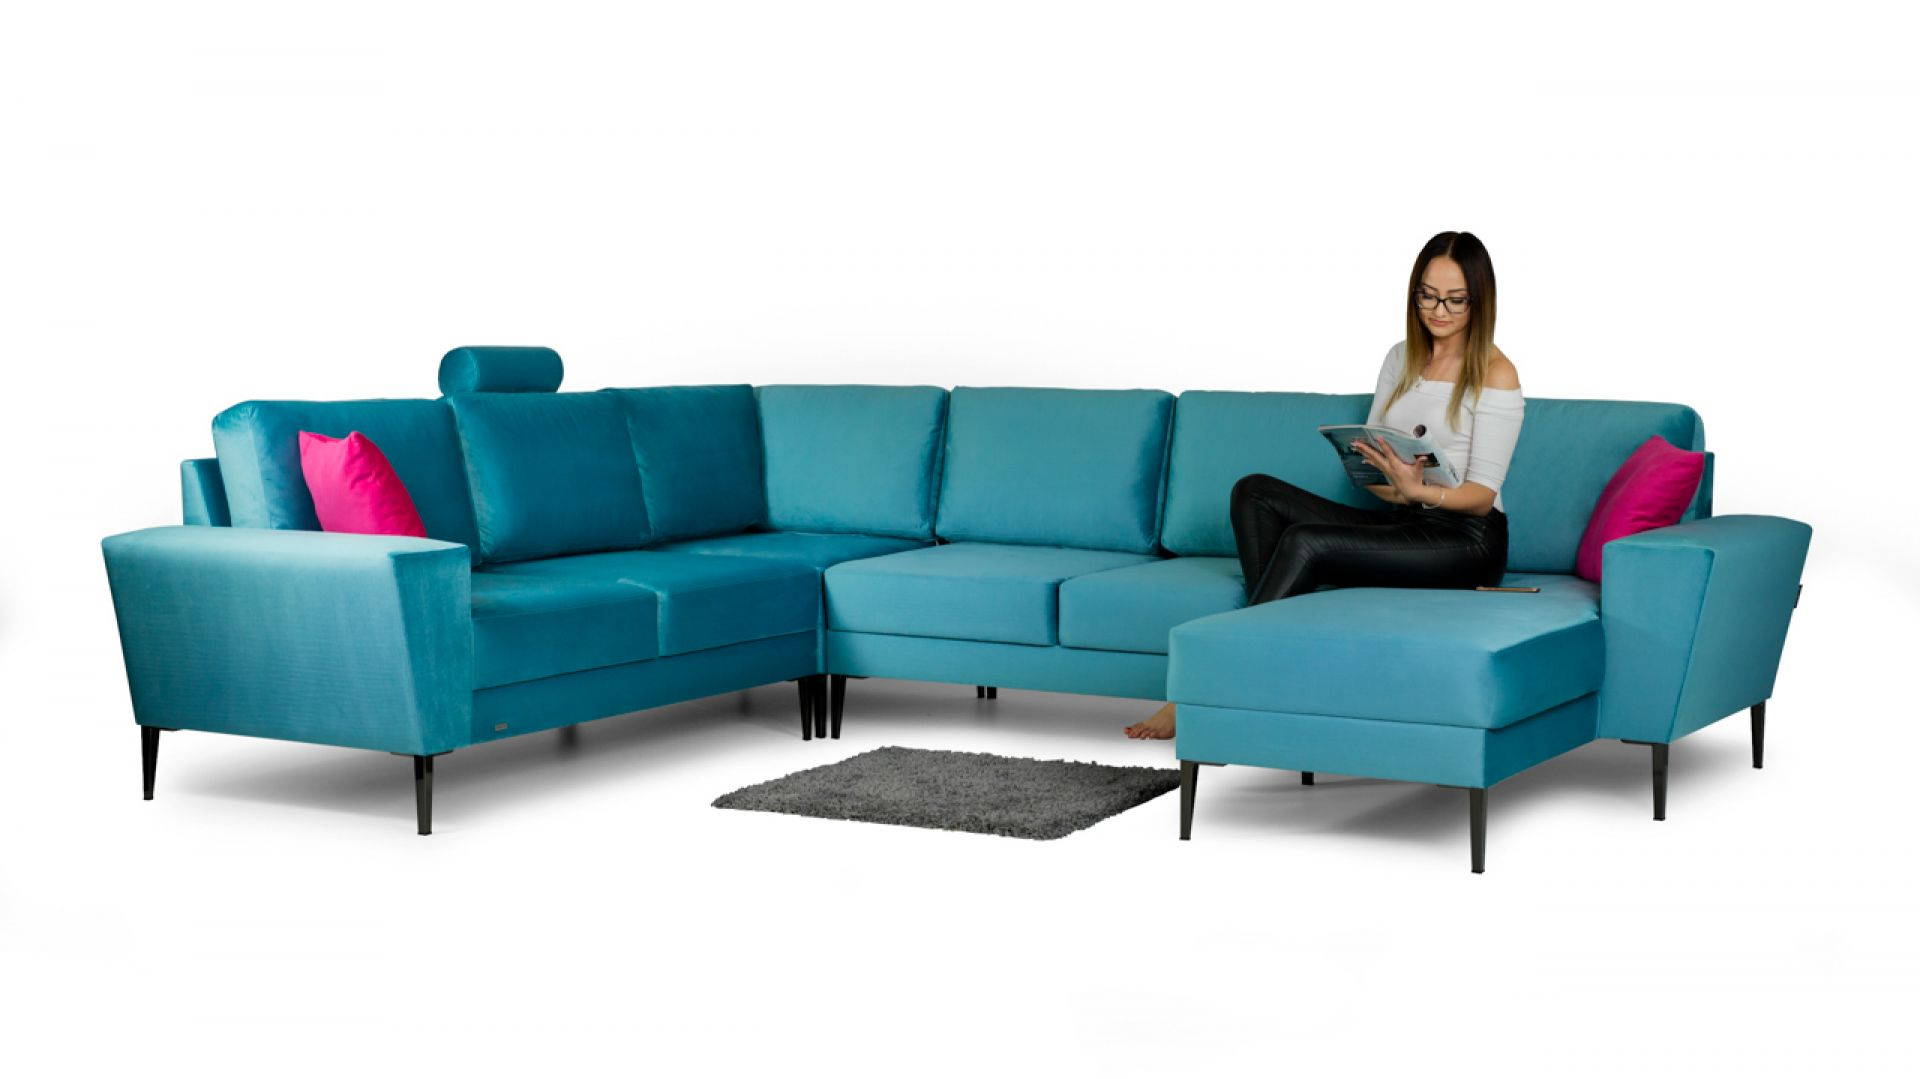 Narożnik VACO/Estetiv. Produkt zgłoszony do konkursu Dobry Design 2019.